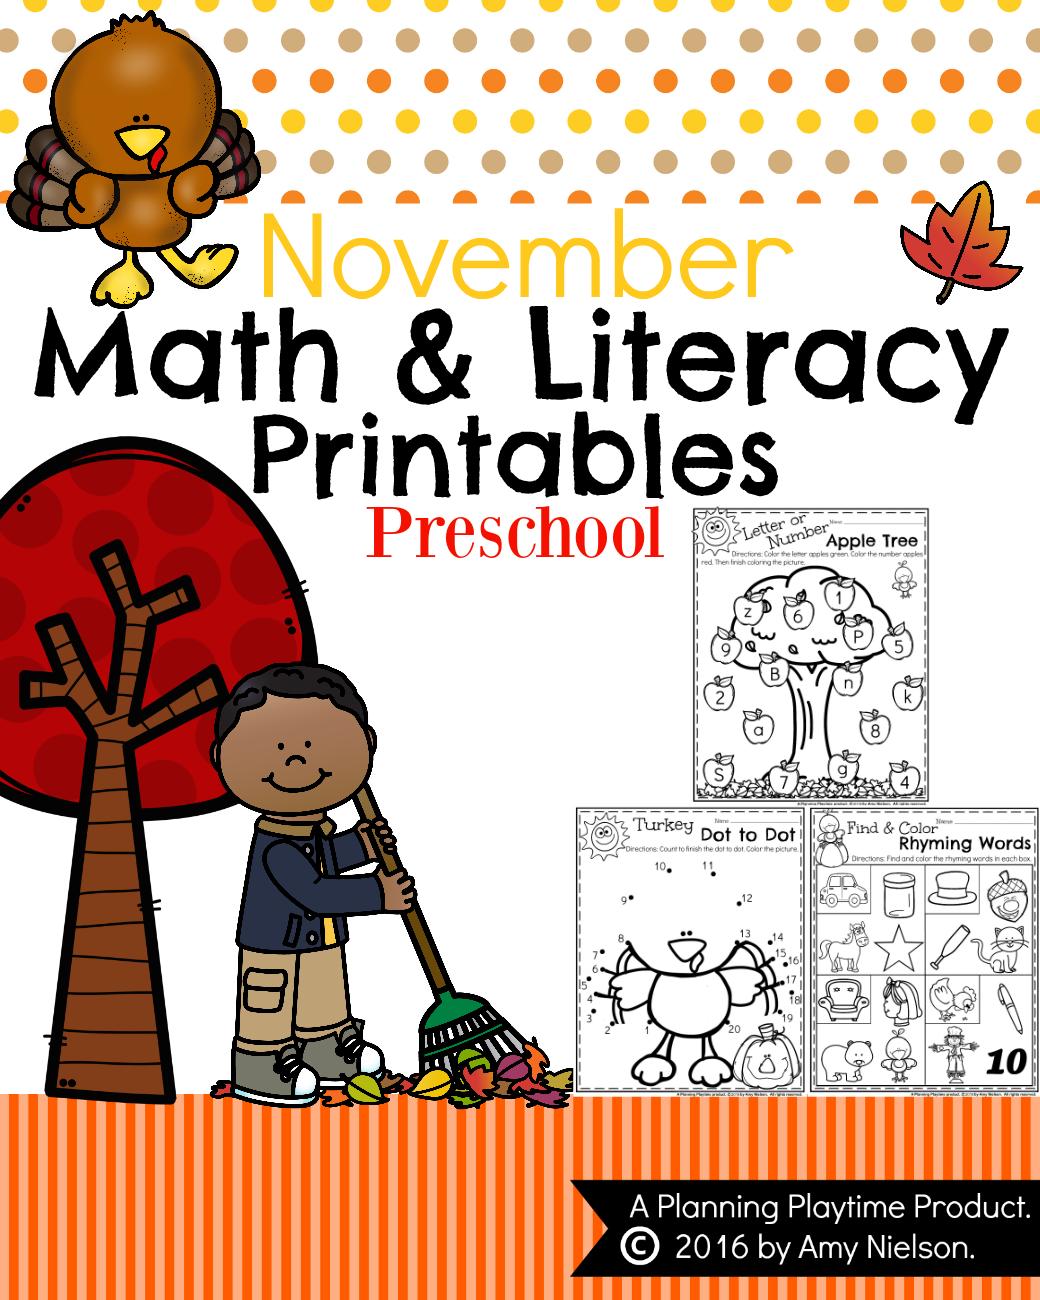 November Preschool Worksheets